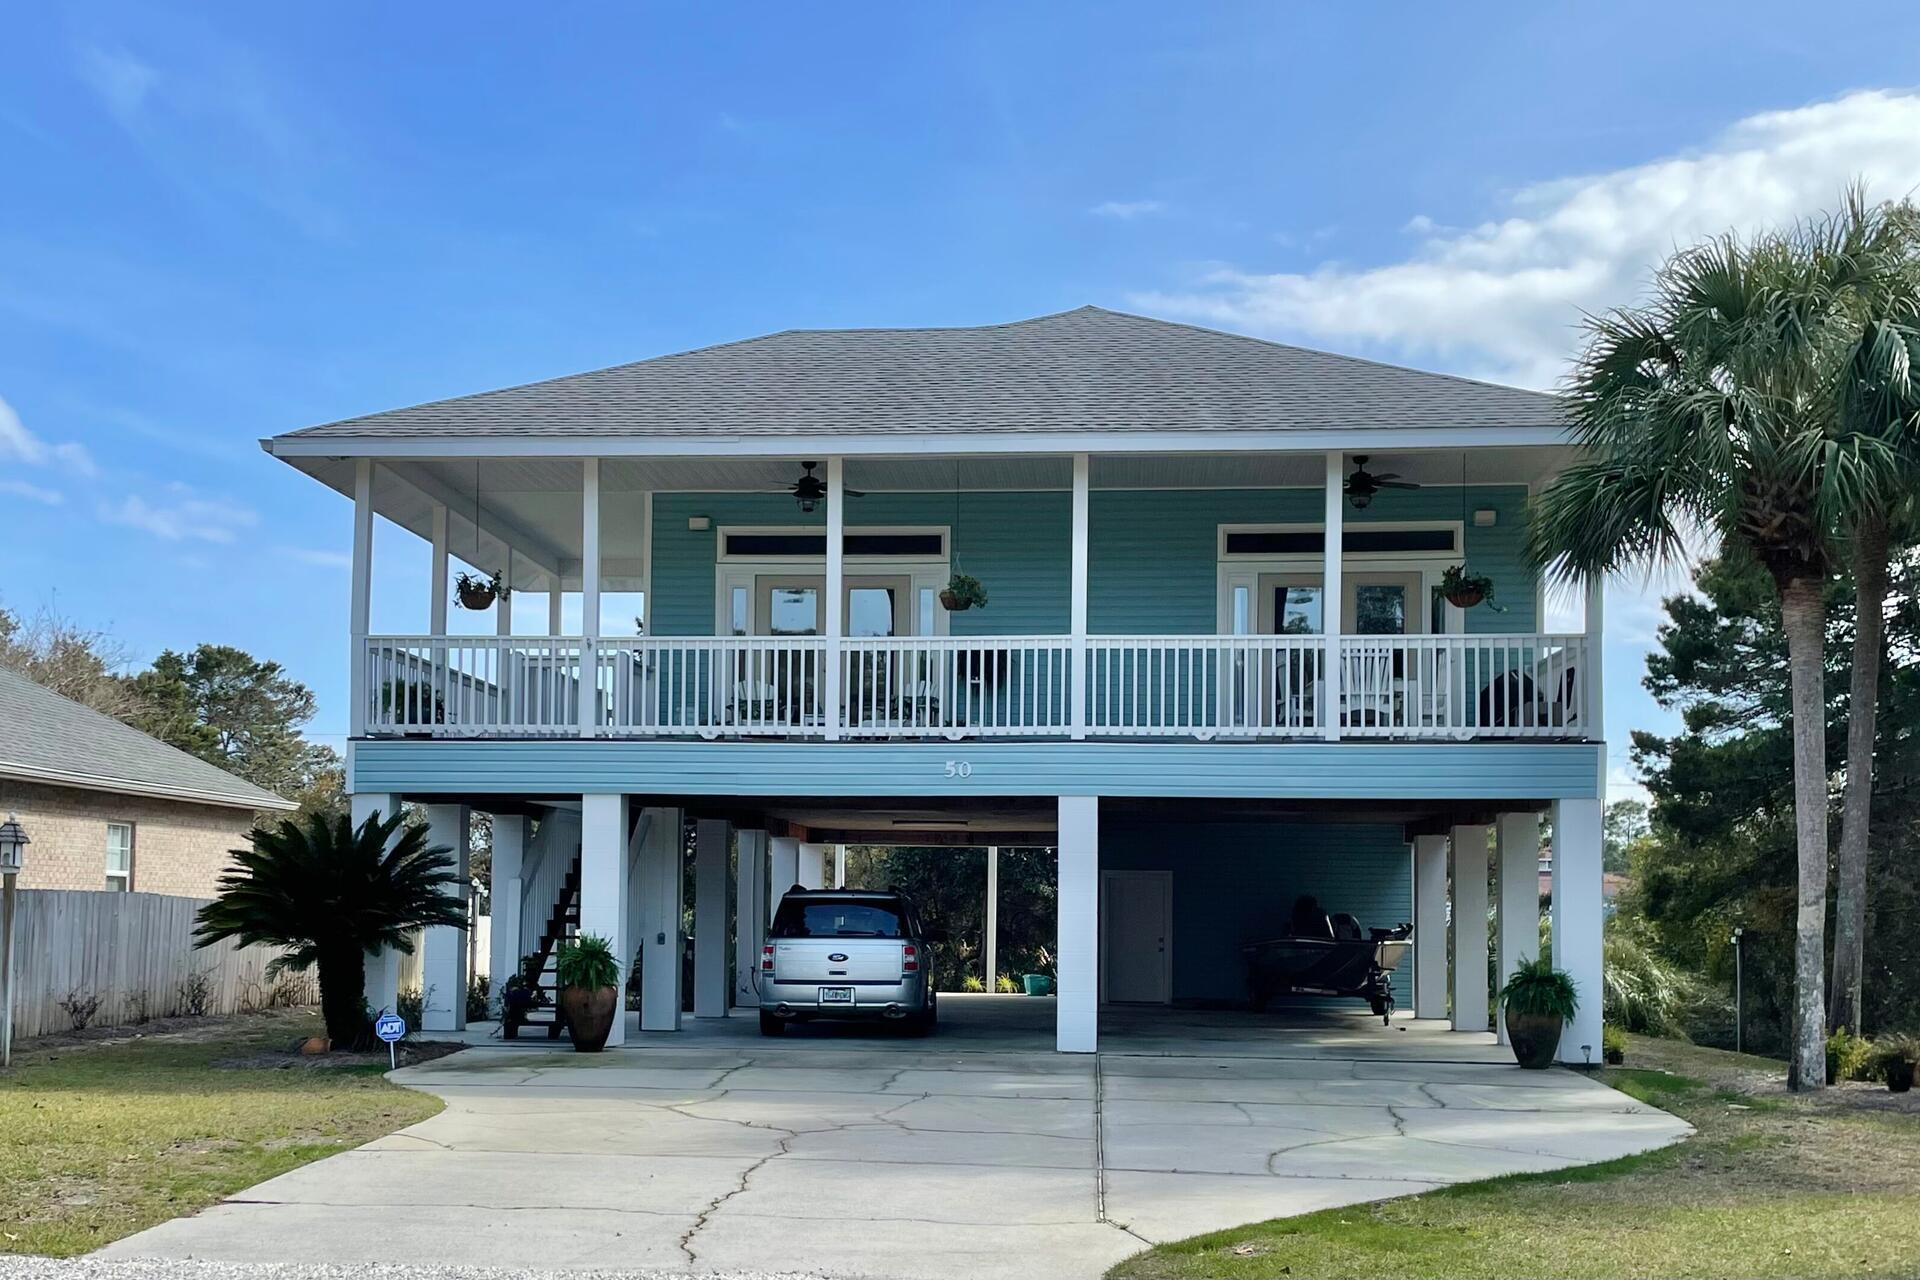 Photo of home for sale at 50 Maple, Santa Rosa Beach FL